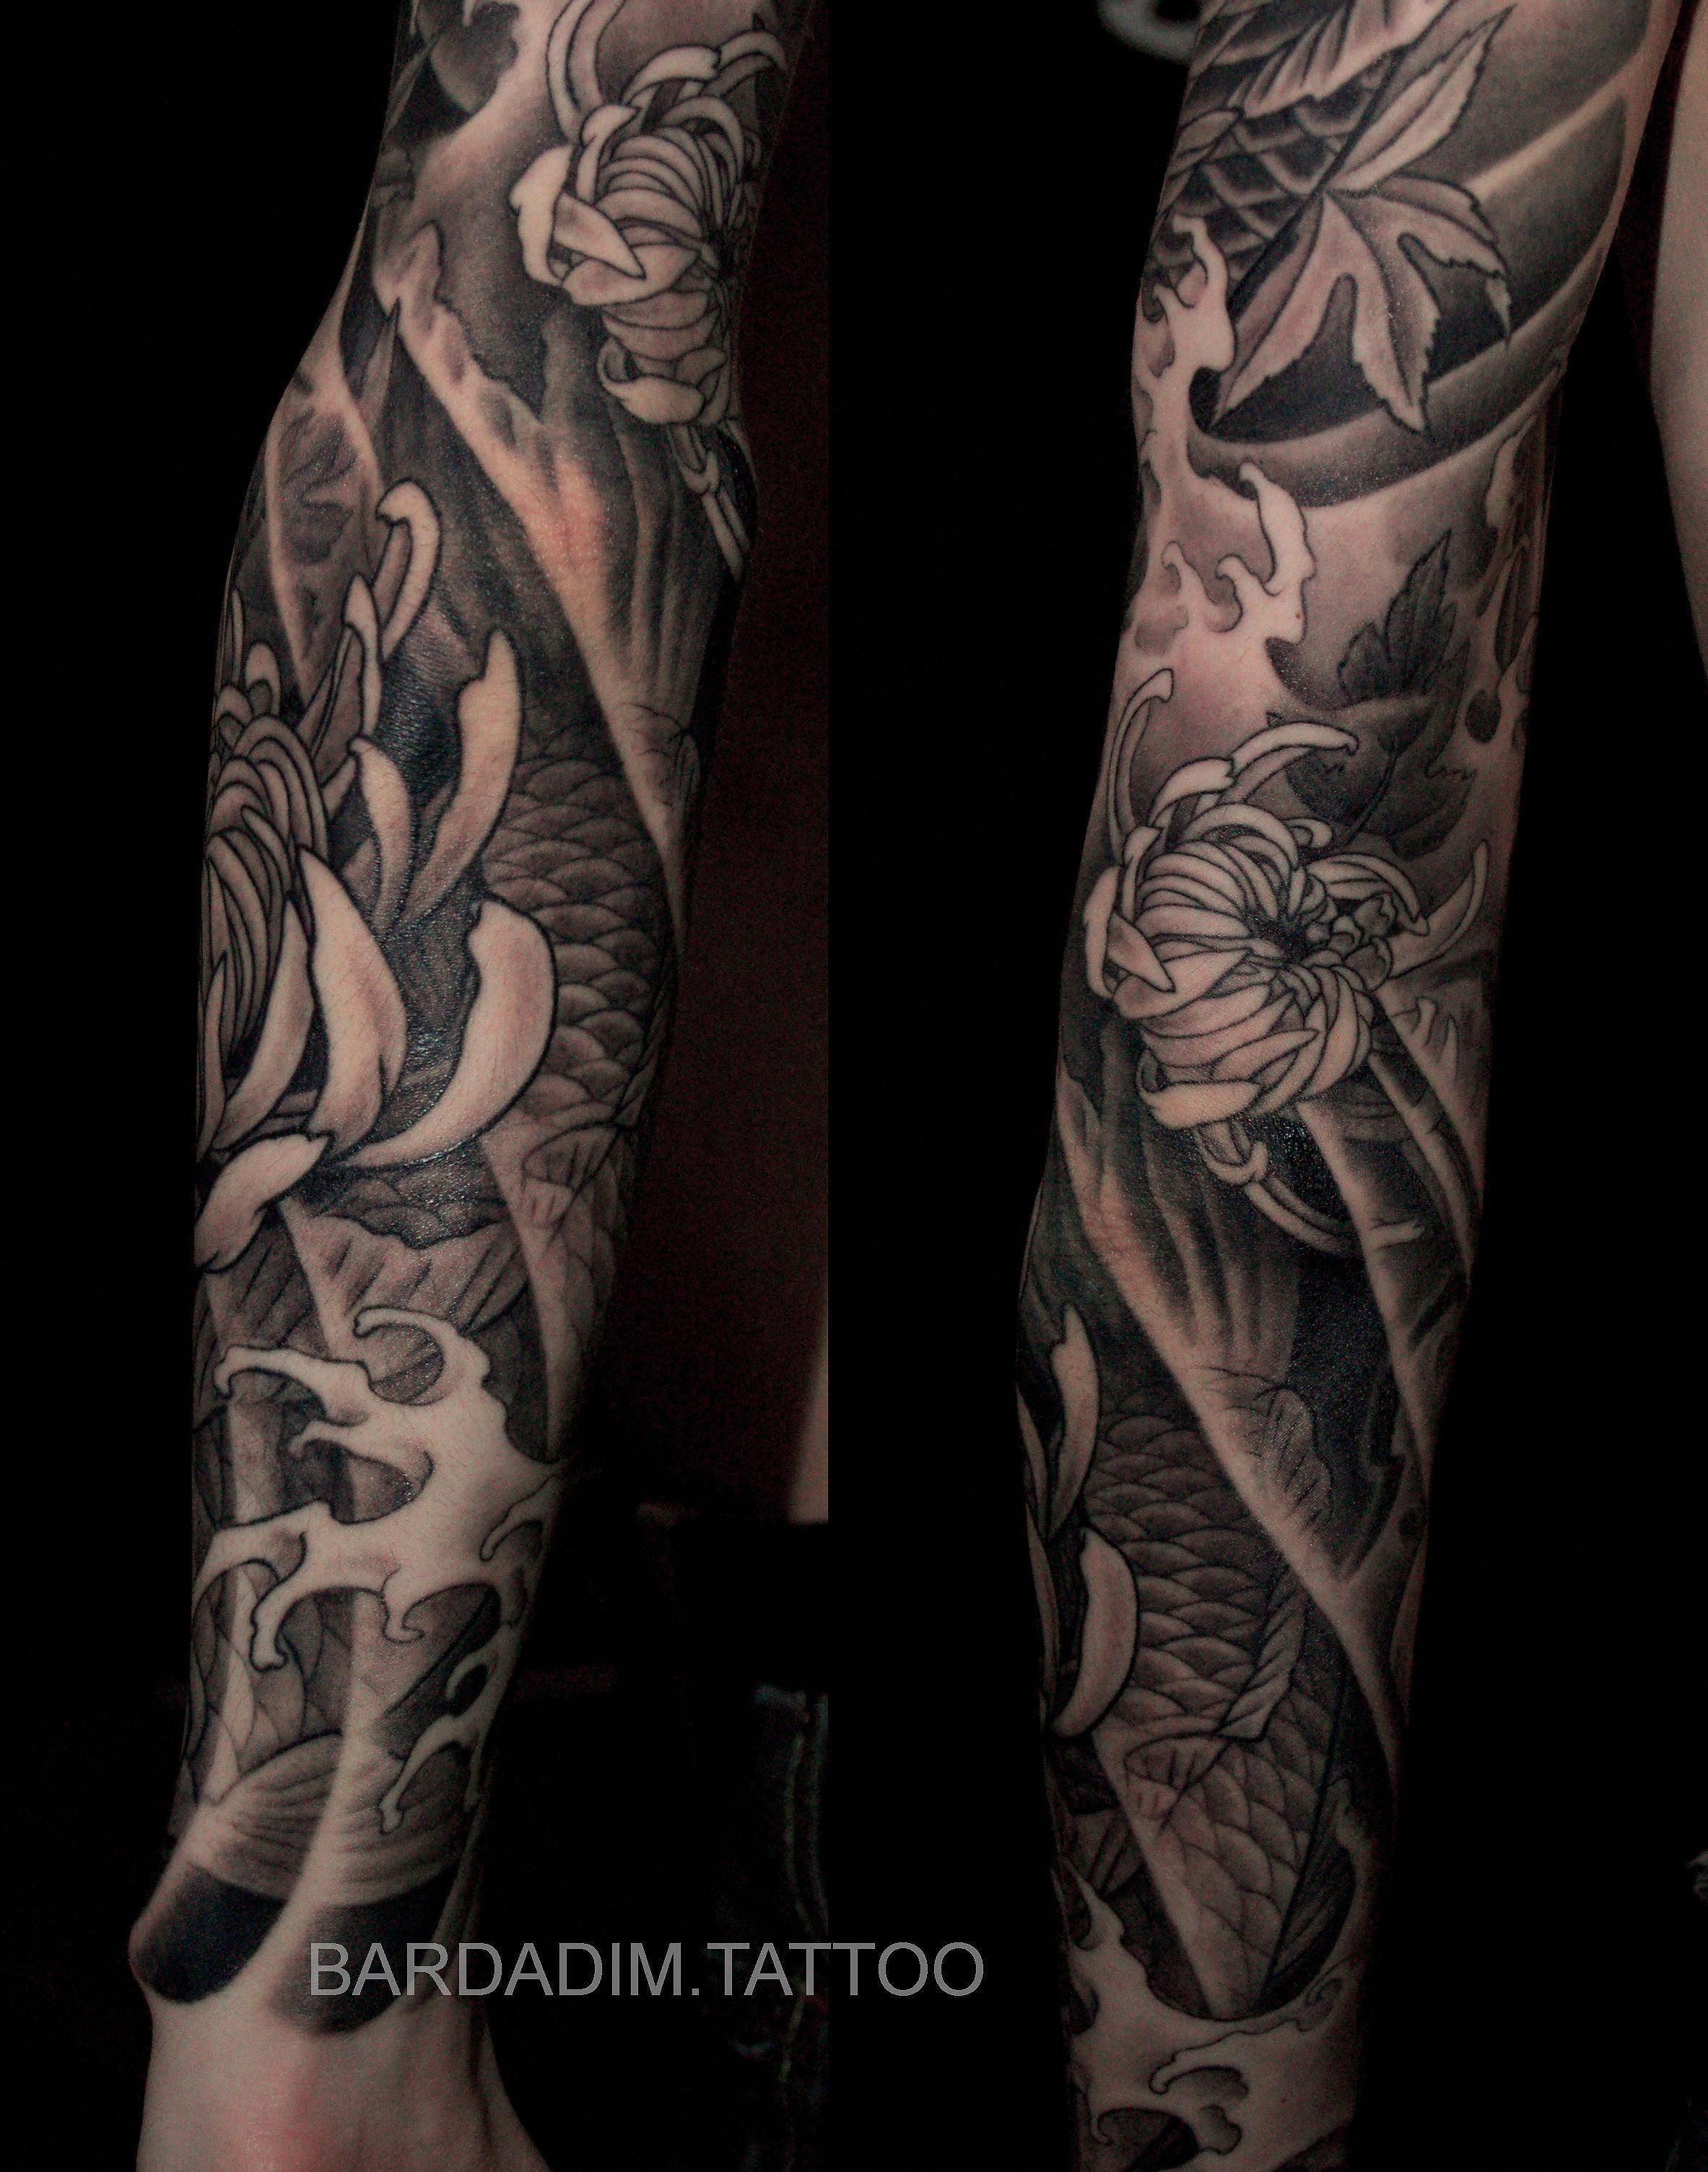 Japanese Tattoo Japanese Sleeve Black And Grey Japanese Tattoo Full Sleeve Tattoo Bardadim Tattoo H Sleeve Tattoos Full Sleeve Tattoos Best Sleeve Tattoos